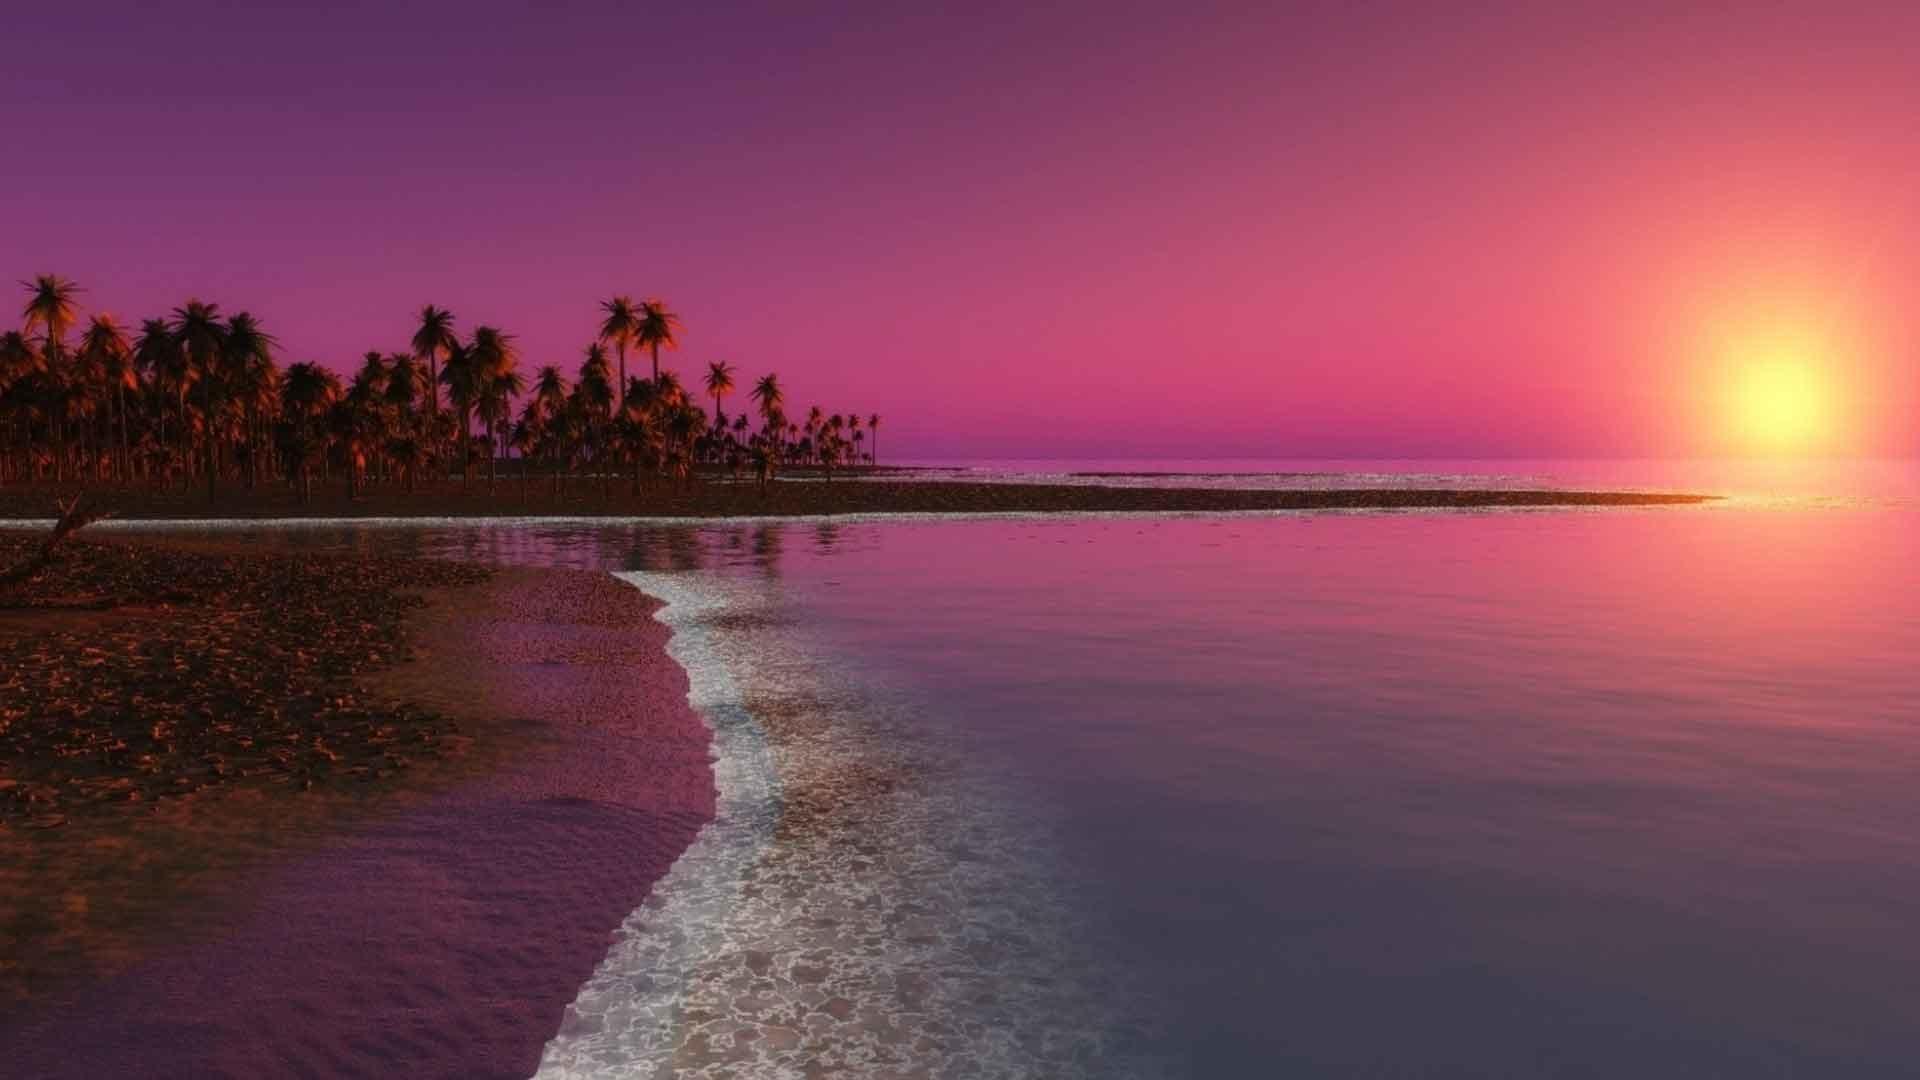 Sunrise Sunset Ocean Reflection Water Beach Hd Wallpapers - Nature Windows 10 Background - HD Wallpaper